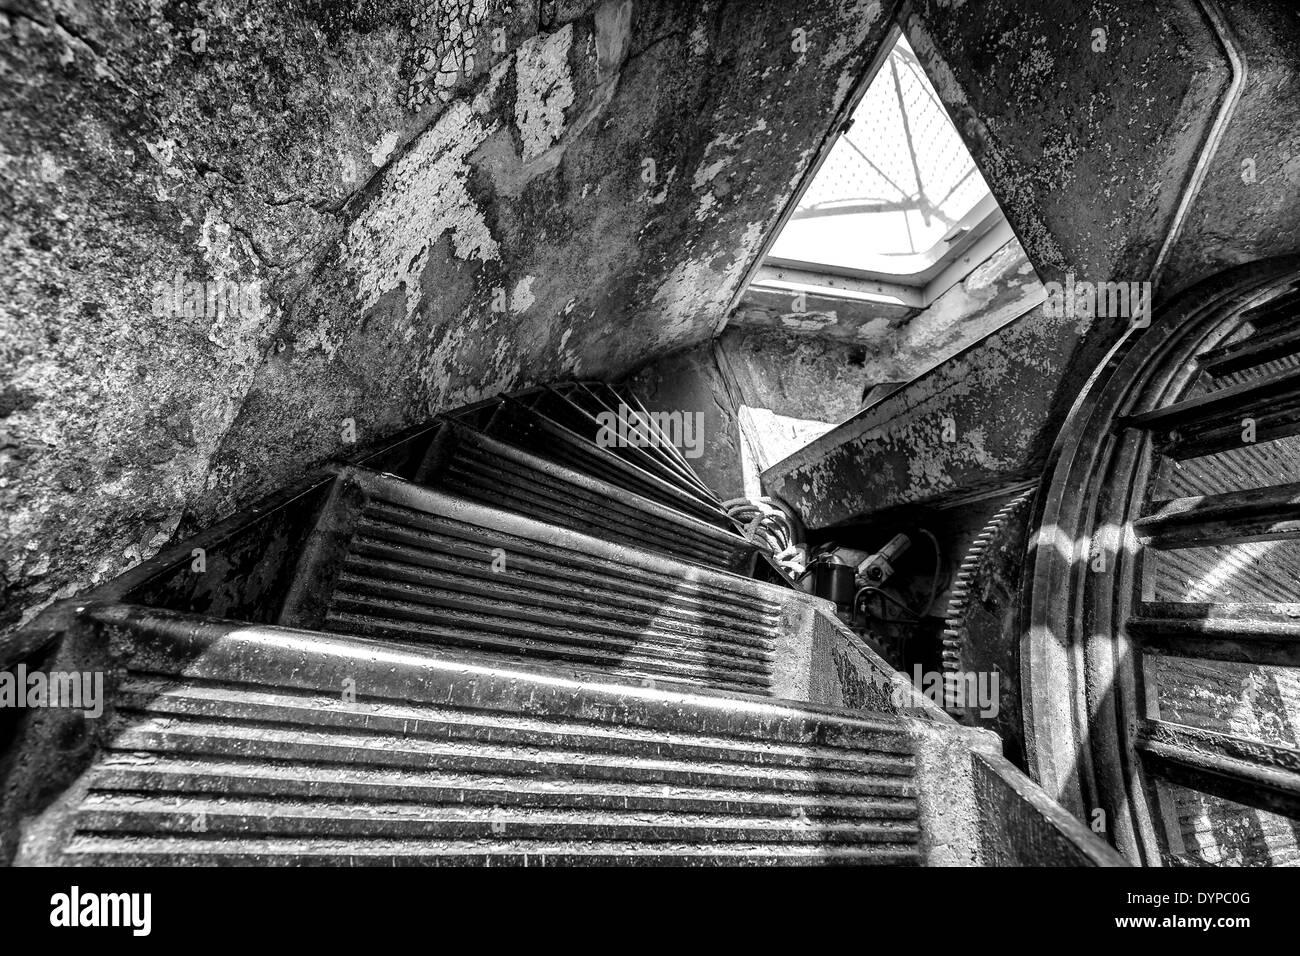 Old Cast Iron Staircase At Söderskär Lighthouse, Porvoo, Finland, EU